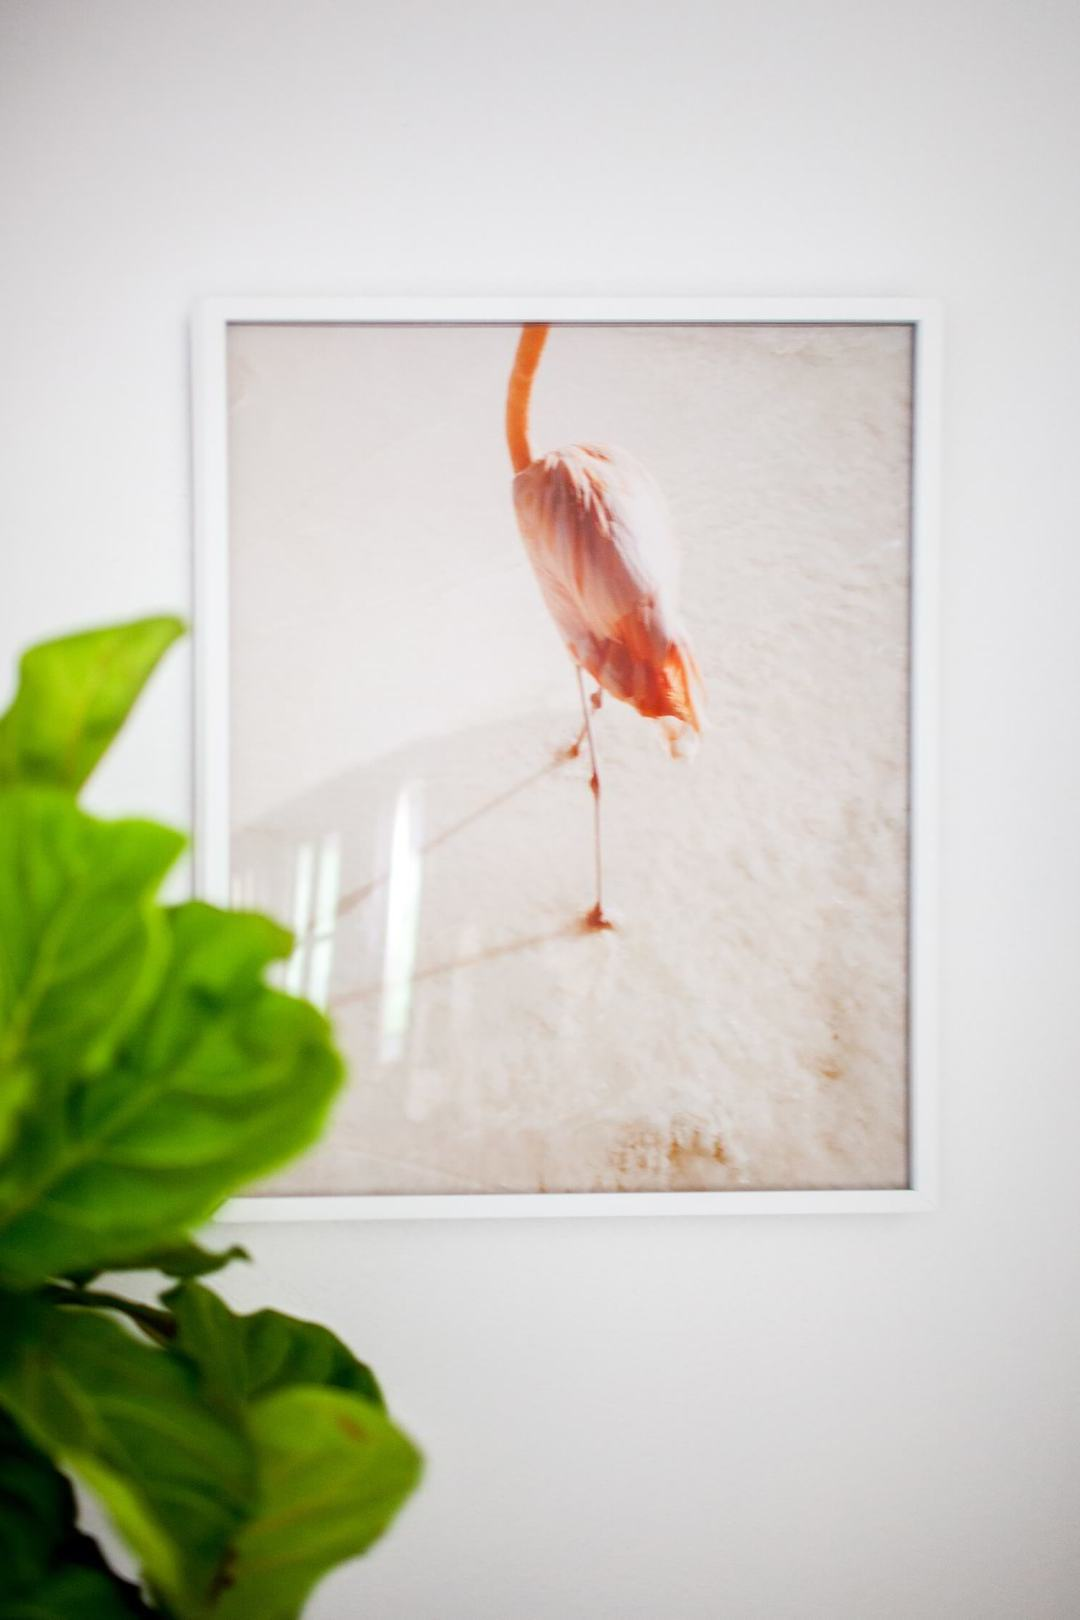 Wanddeko Wohnzimmer Flamingo